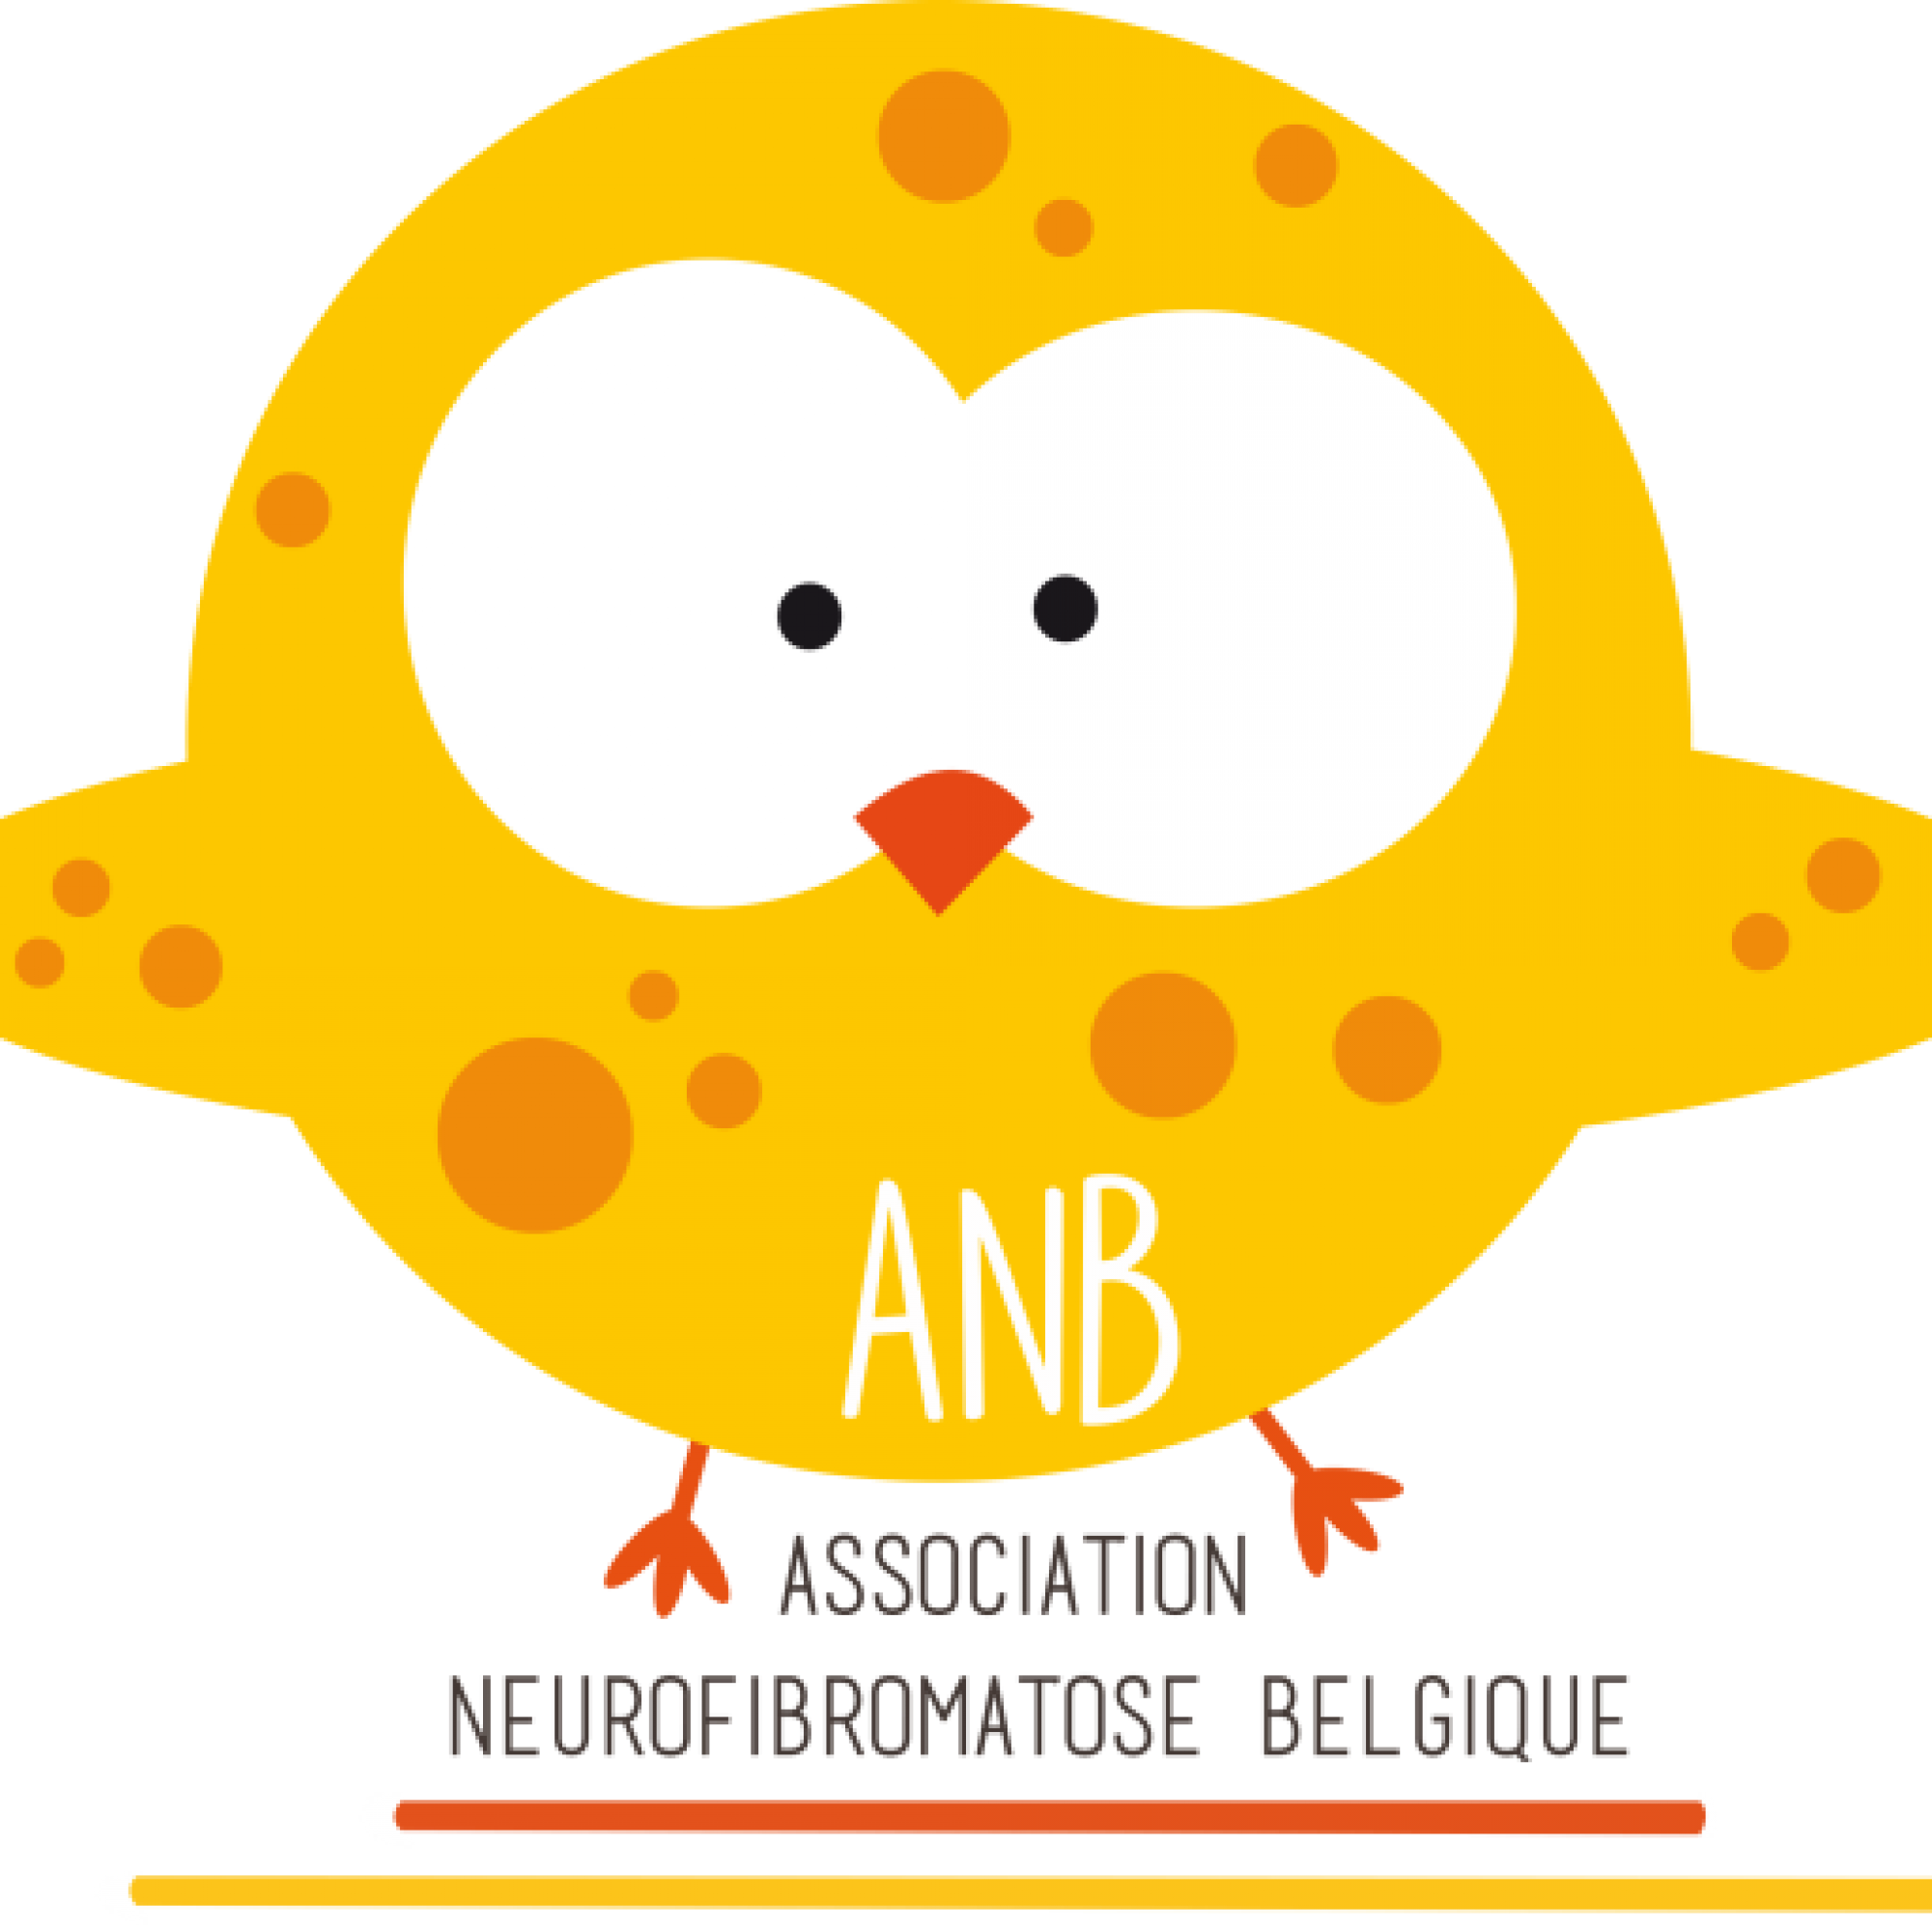 Neurofibromatose Belgique